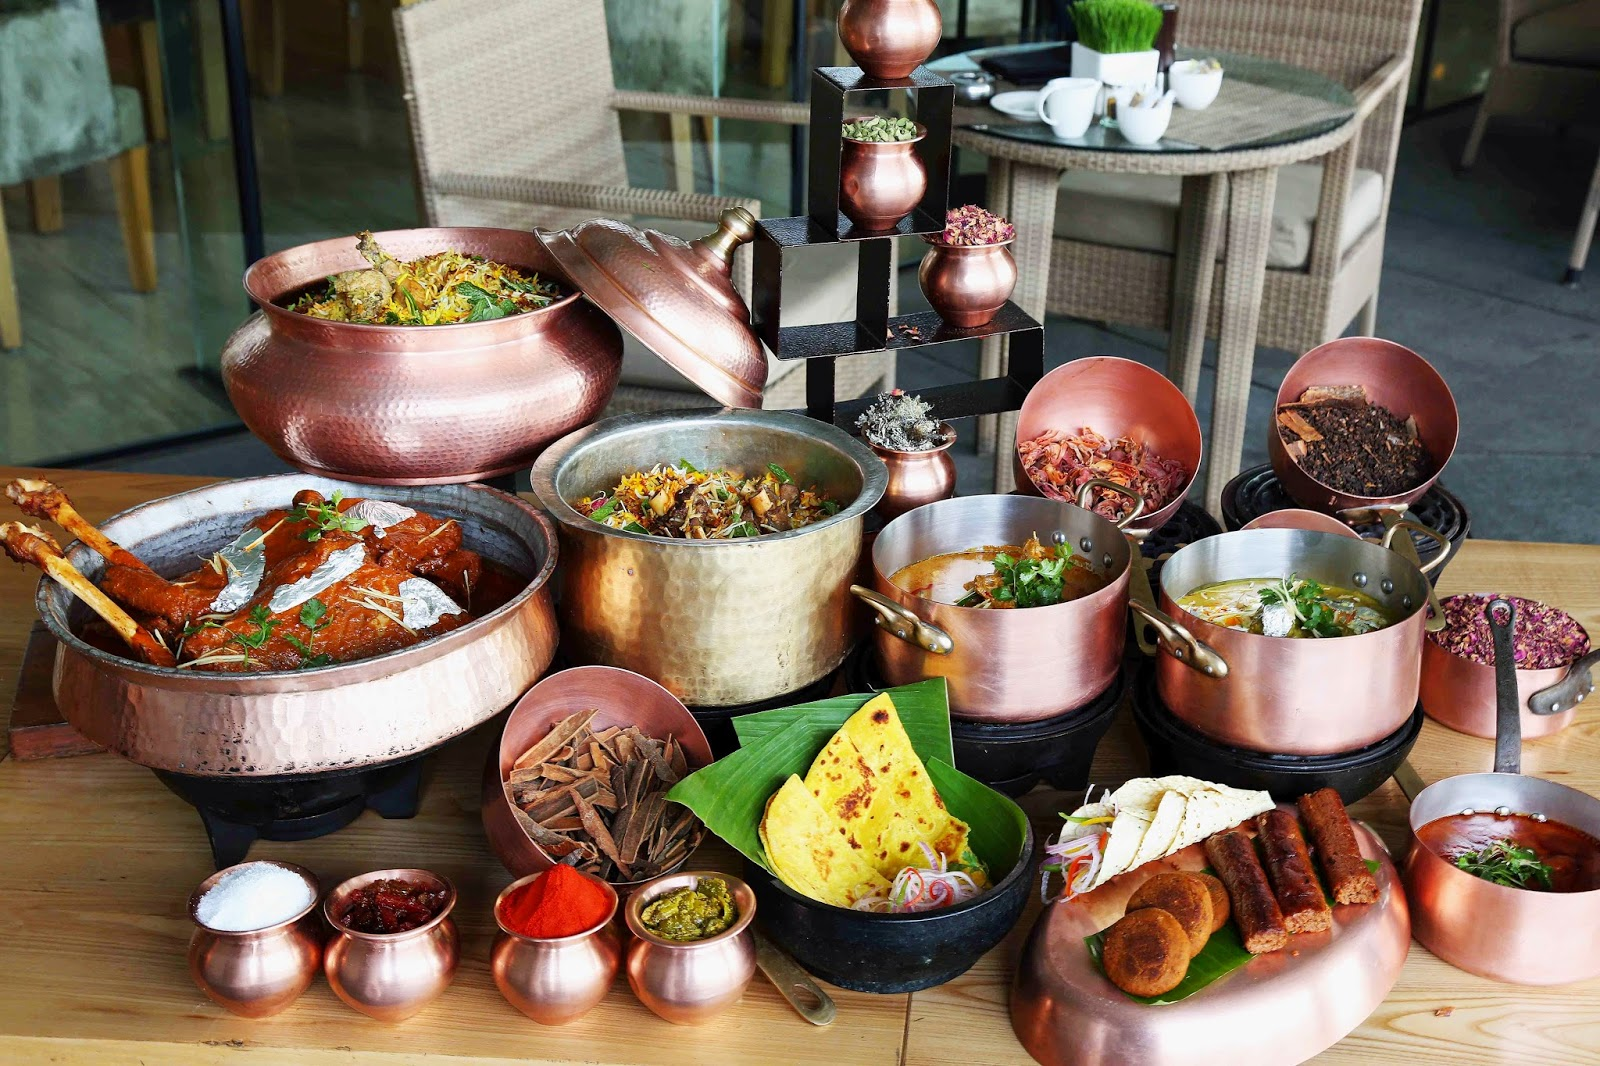 Foodmaniacs daawat e lazeez awadhi food festival the for Awadhi cuisine vegetarian